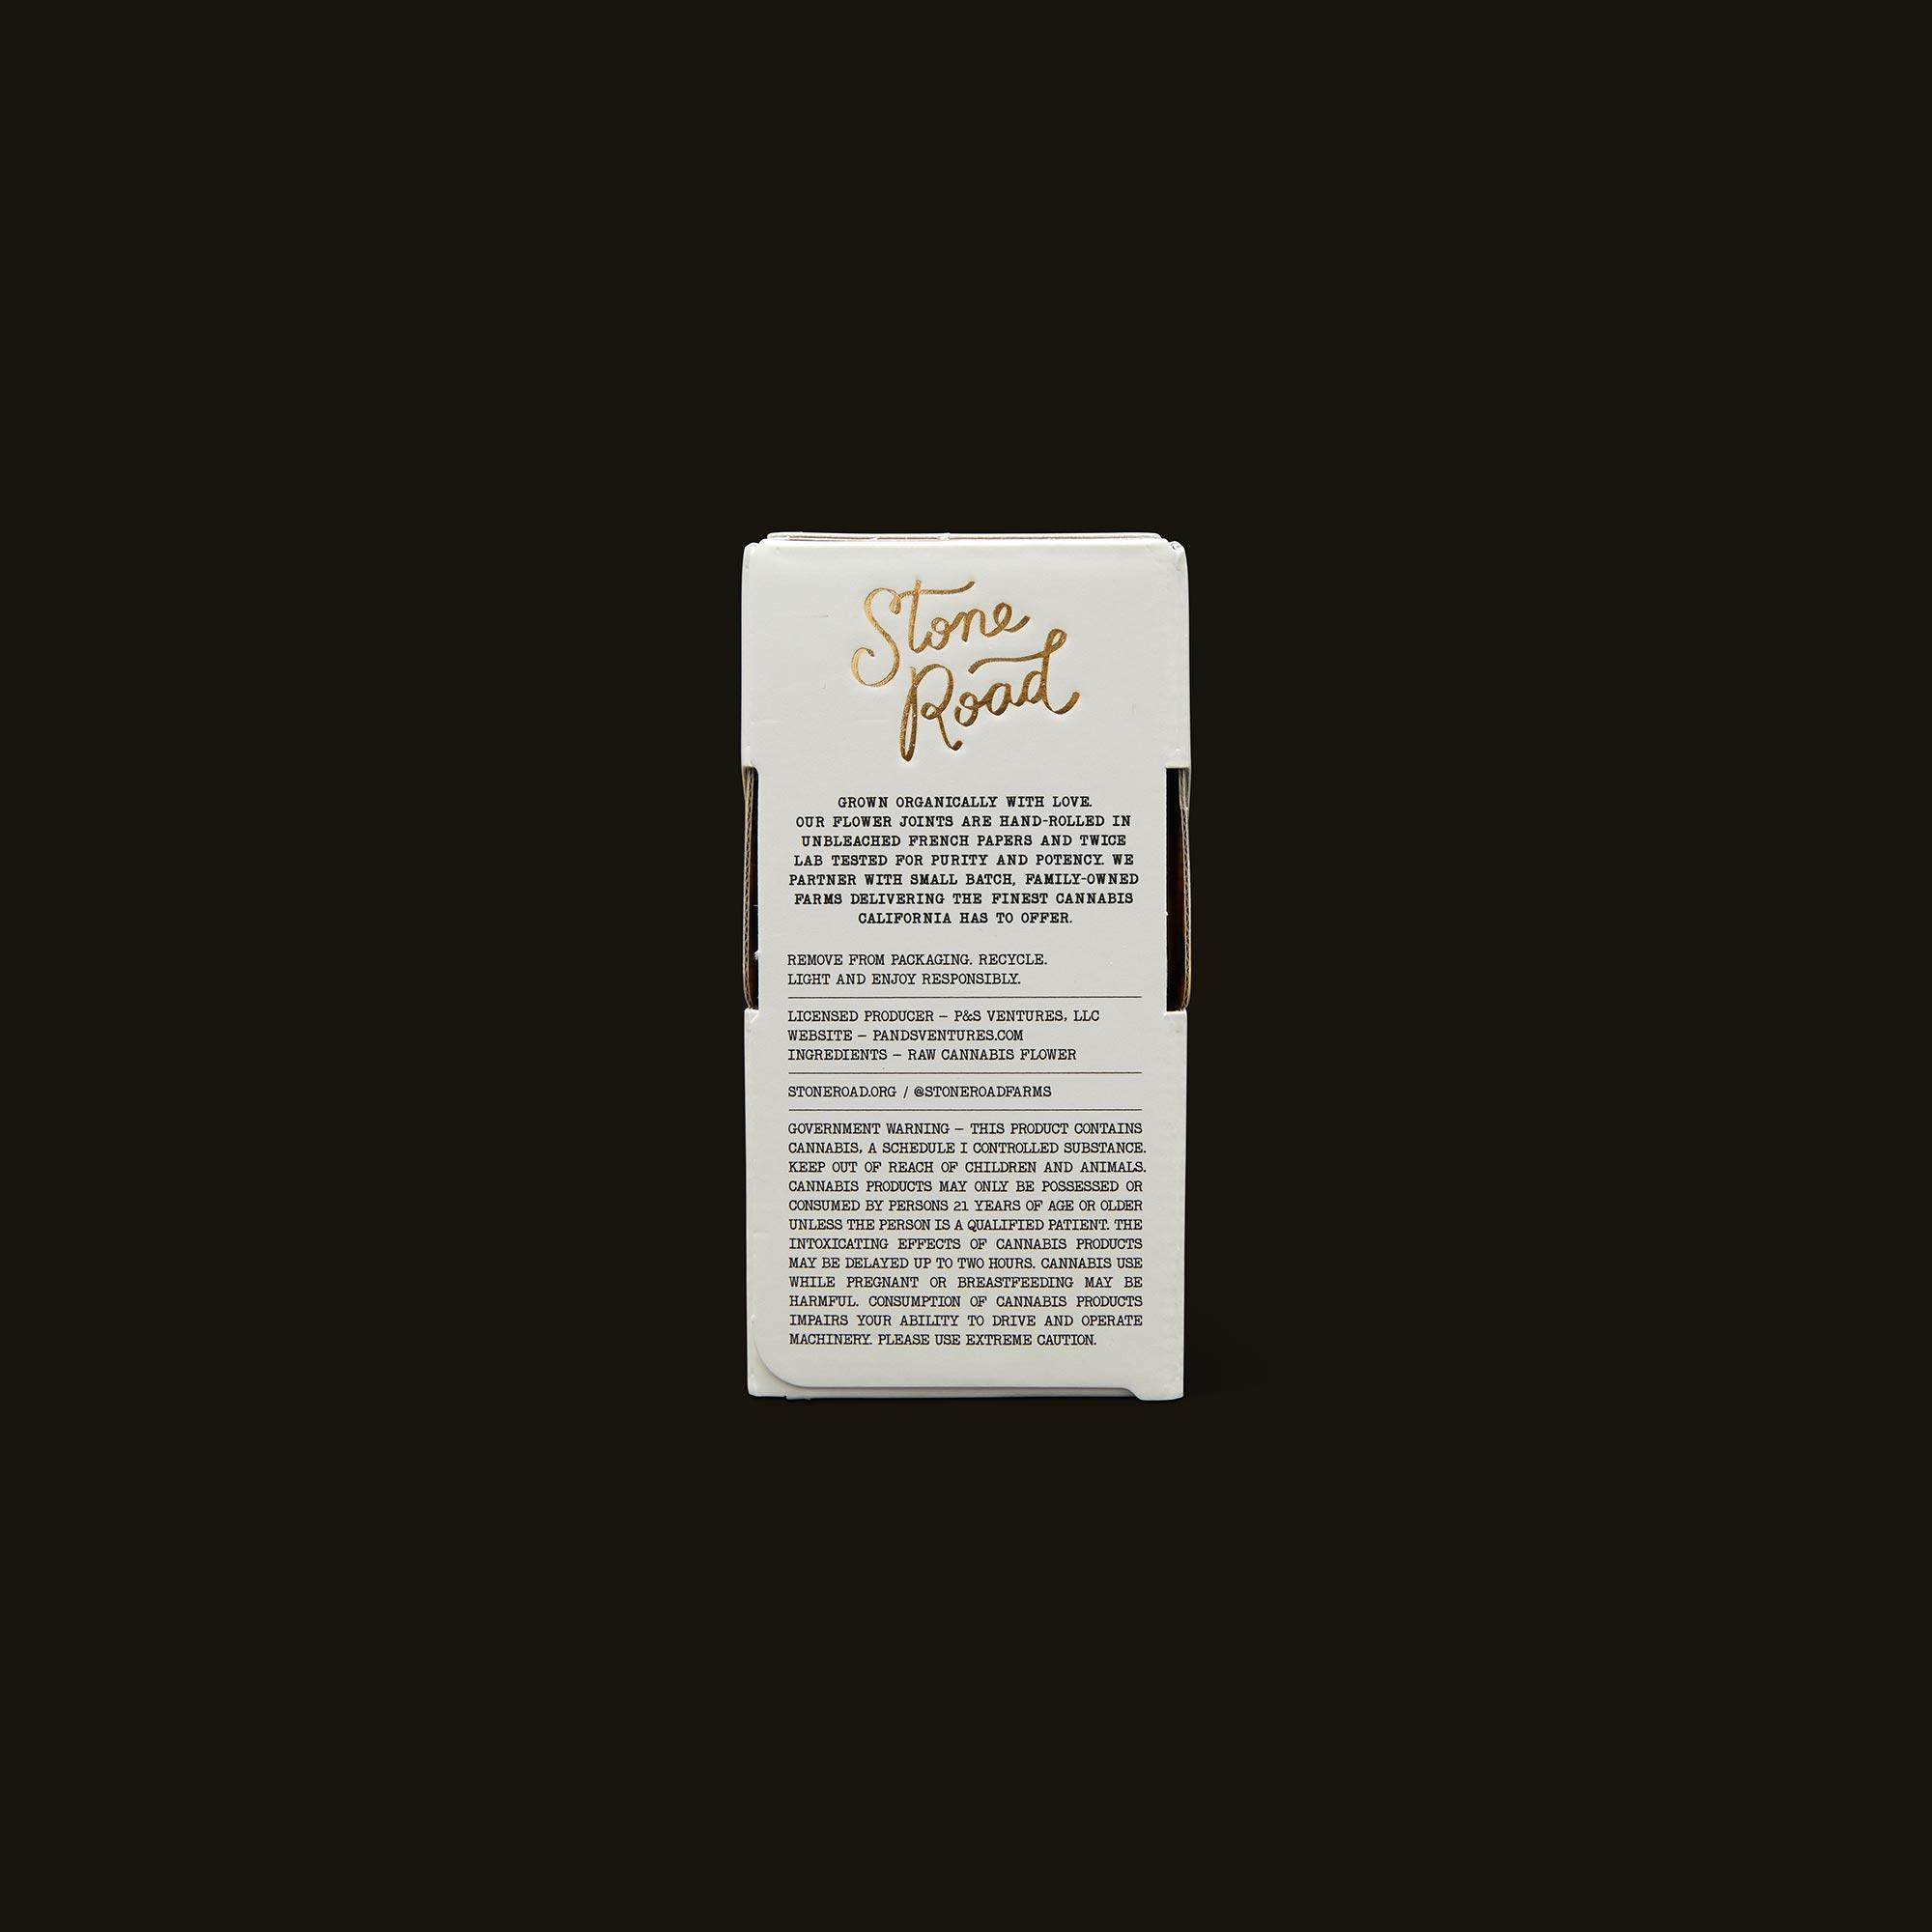 Stone Road Pre-Rolls - Papaya Punch Pre-Roll Pack